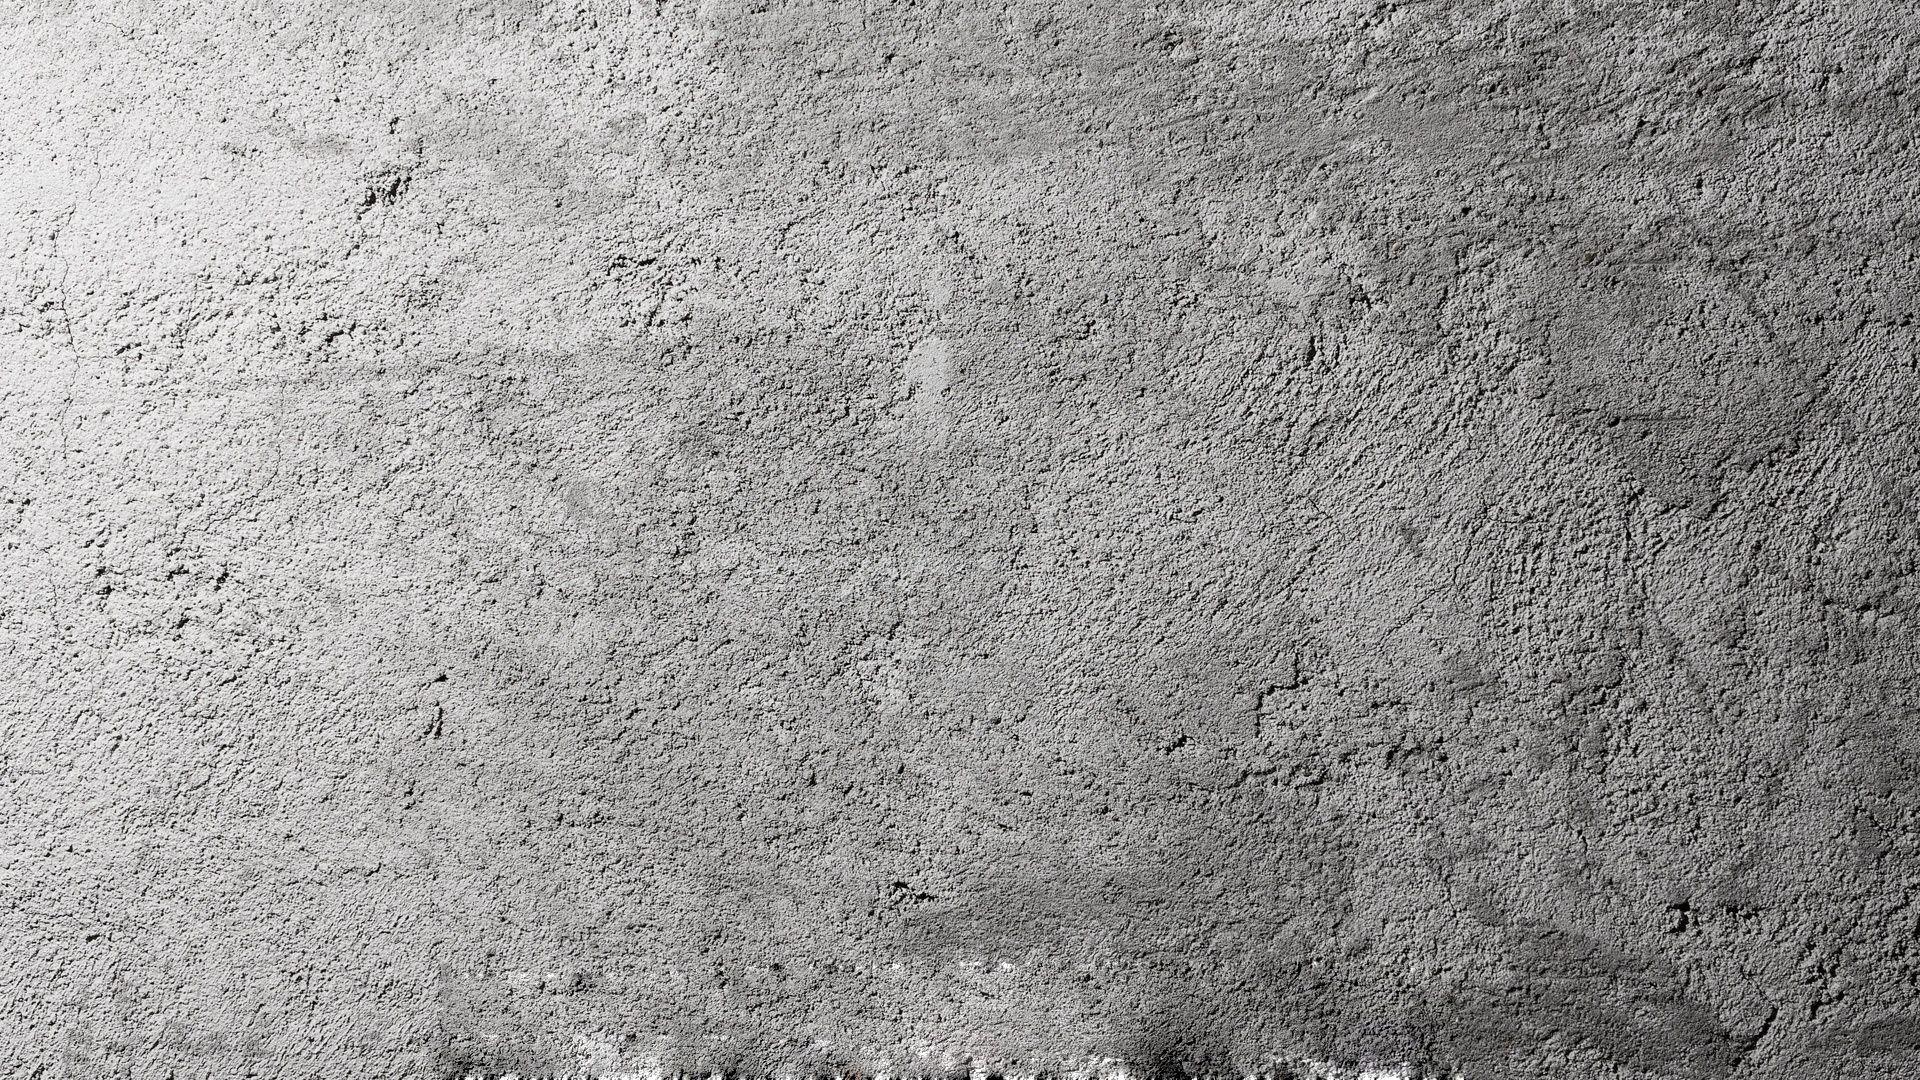 Free cement wallpaper hd. | Texture | Concrete texture, Concrete wall texture, Textured background